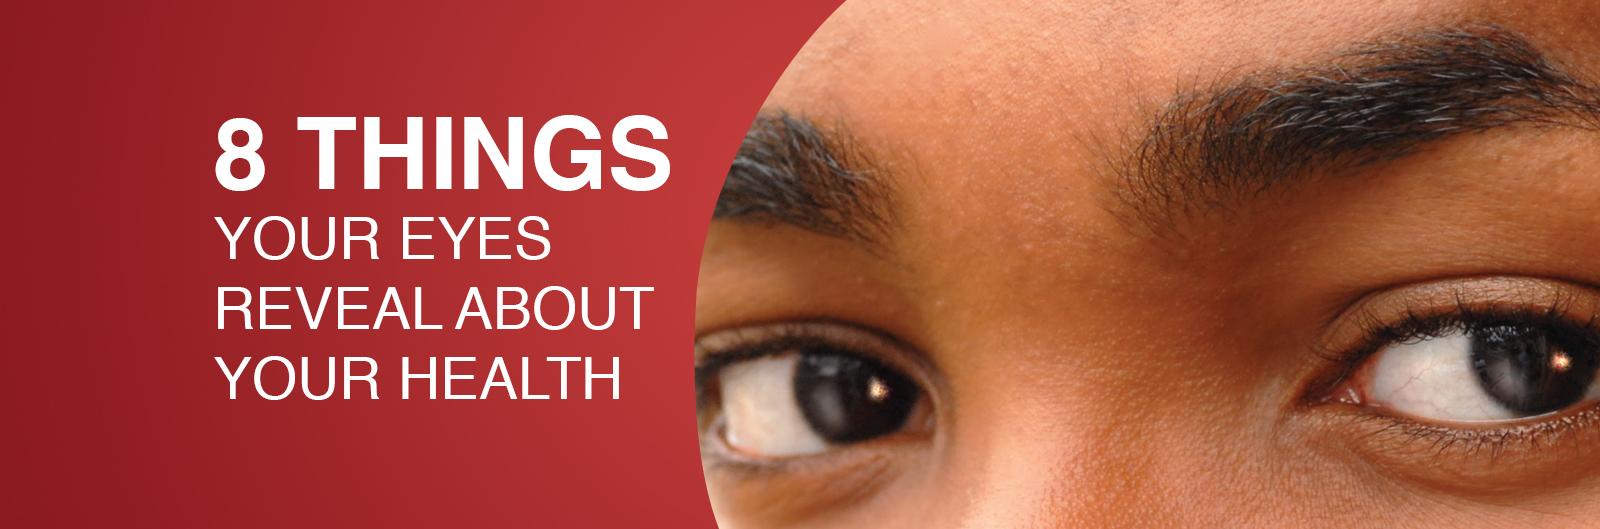 Courts Optical Guyana   Eye Exam Optometrist & Vision Care Center In Guyana